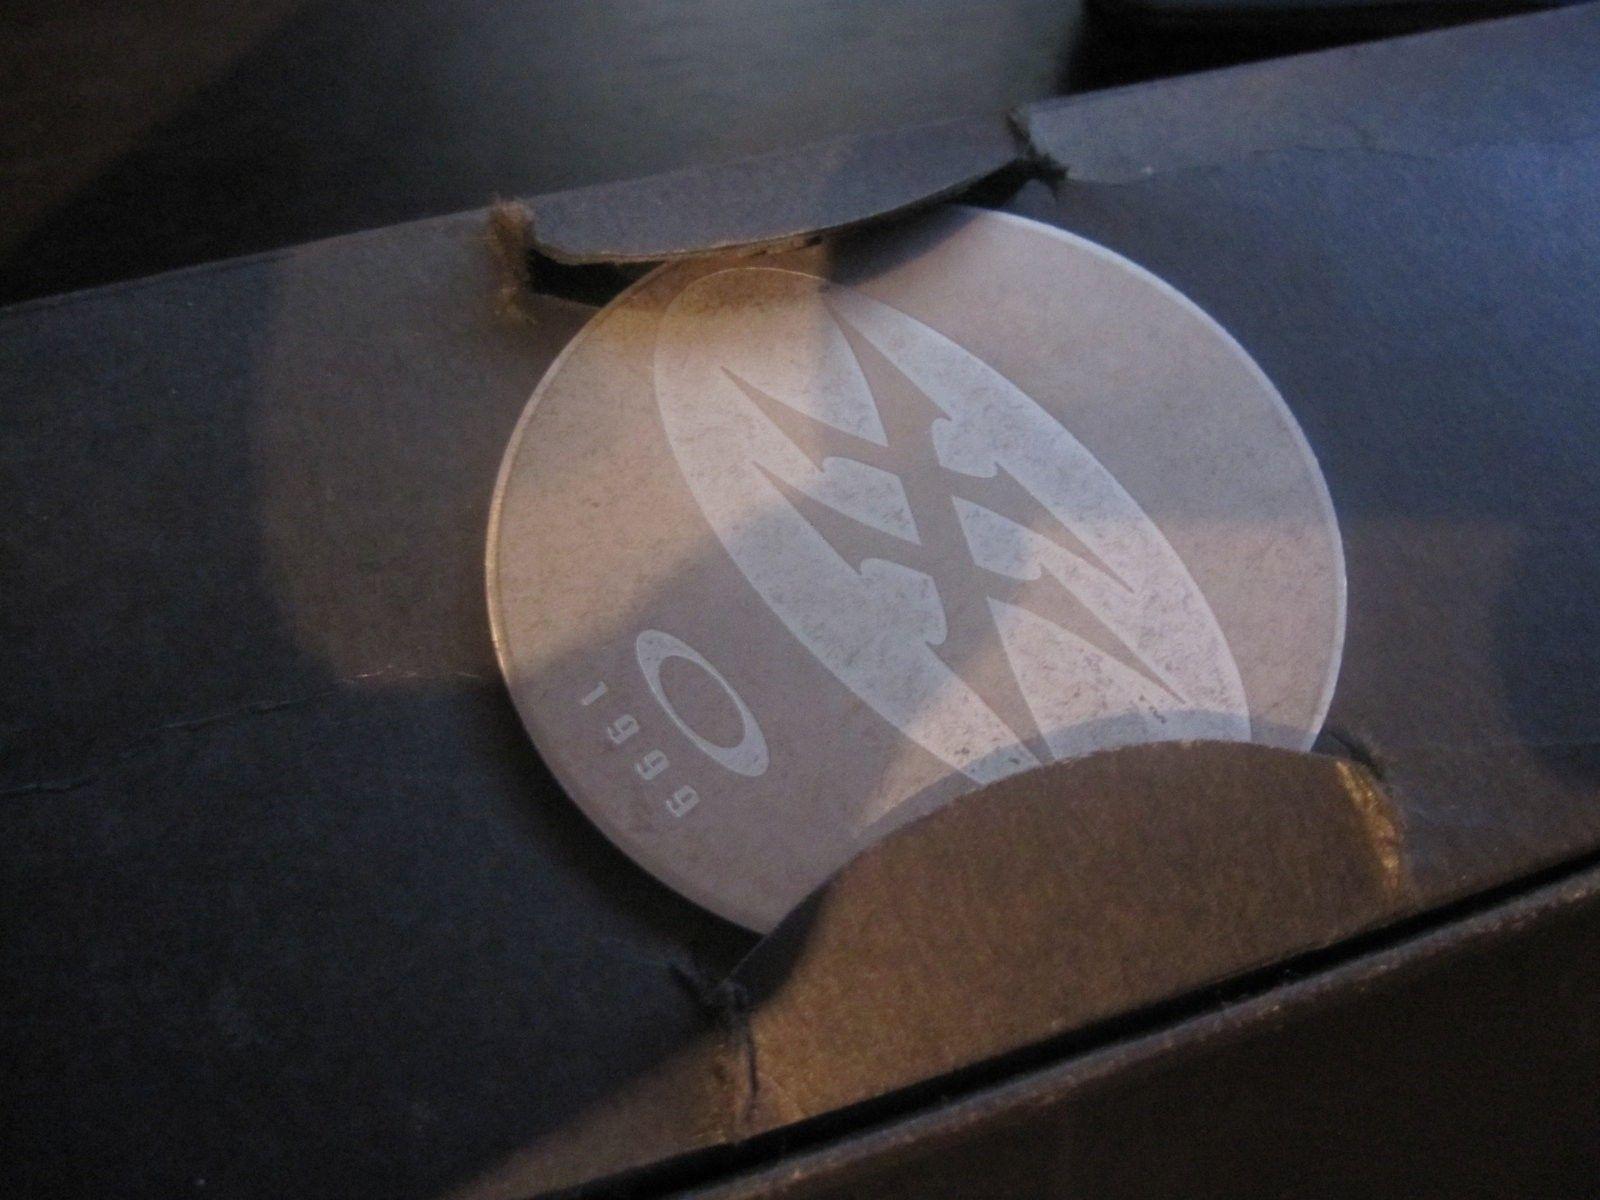 Box & Coin for XX XM/BI *** GONE *** - IMG_5277.JPG